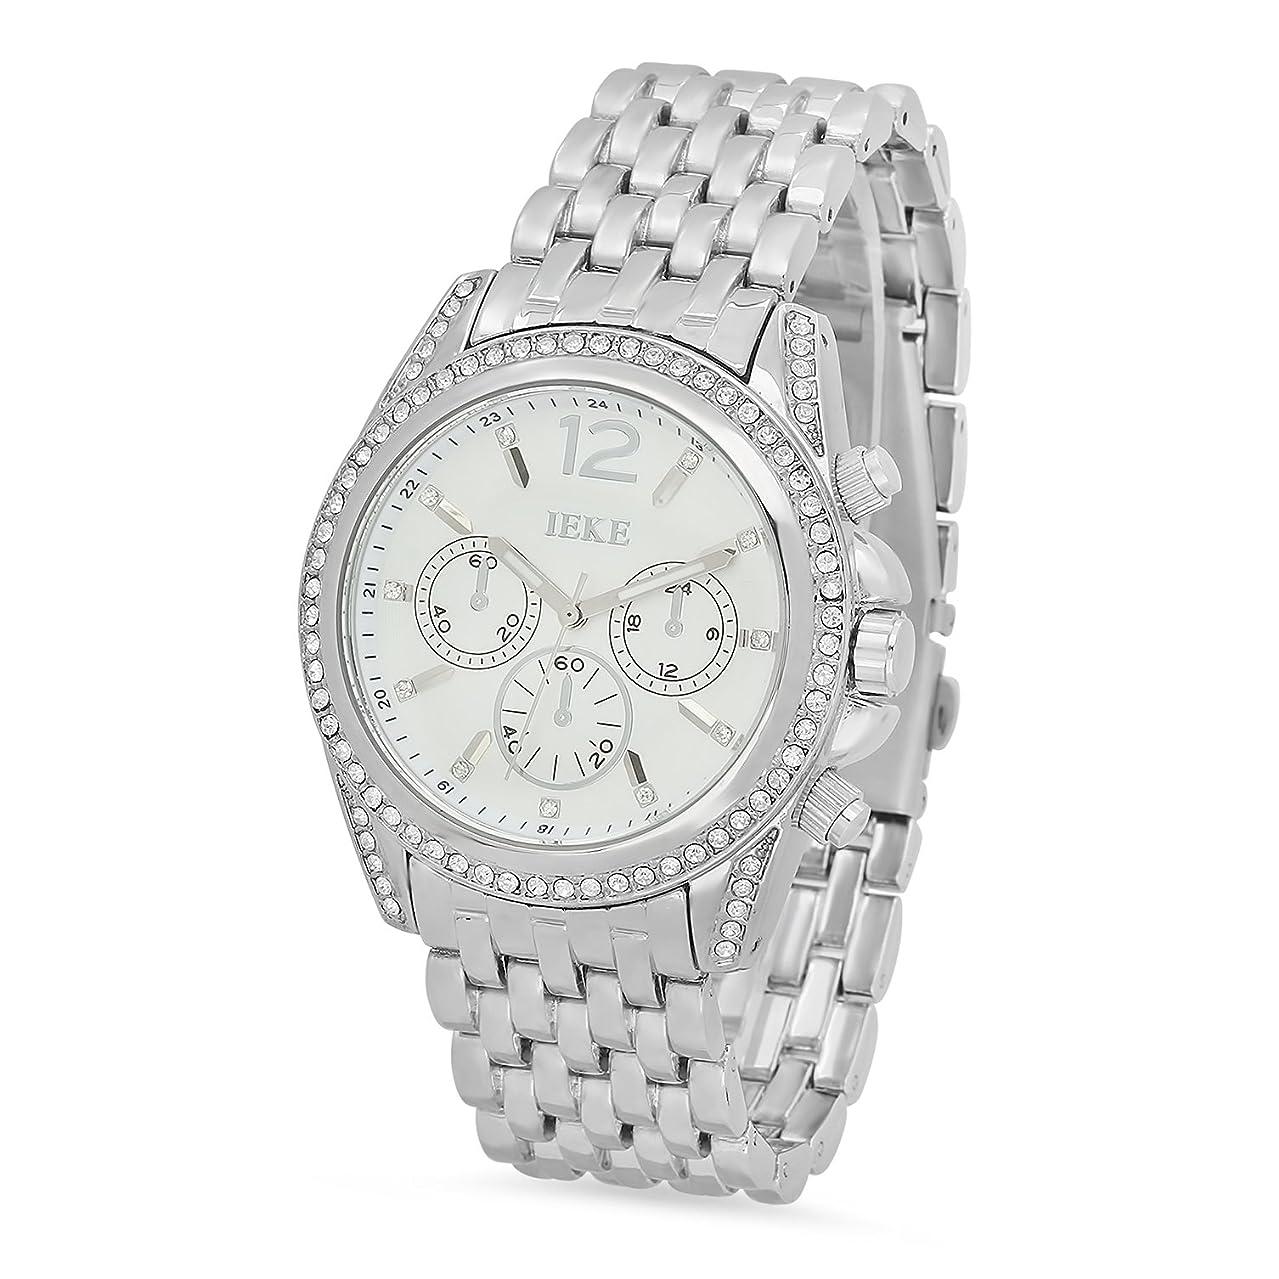 Rhodium Plated White Dial IEKE CZ Bezel Watch w/Trapezoidal Band + Microfiber Jewelry Polishing Cloth